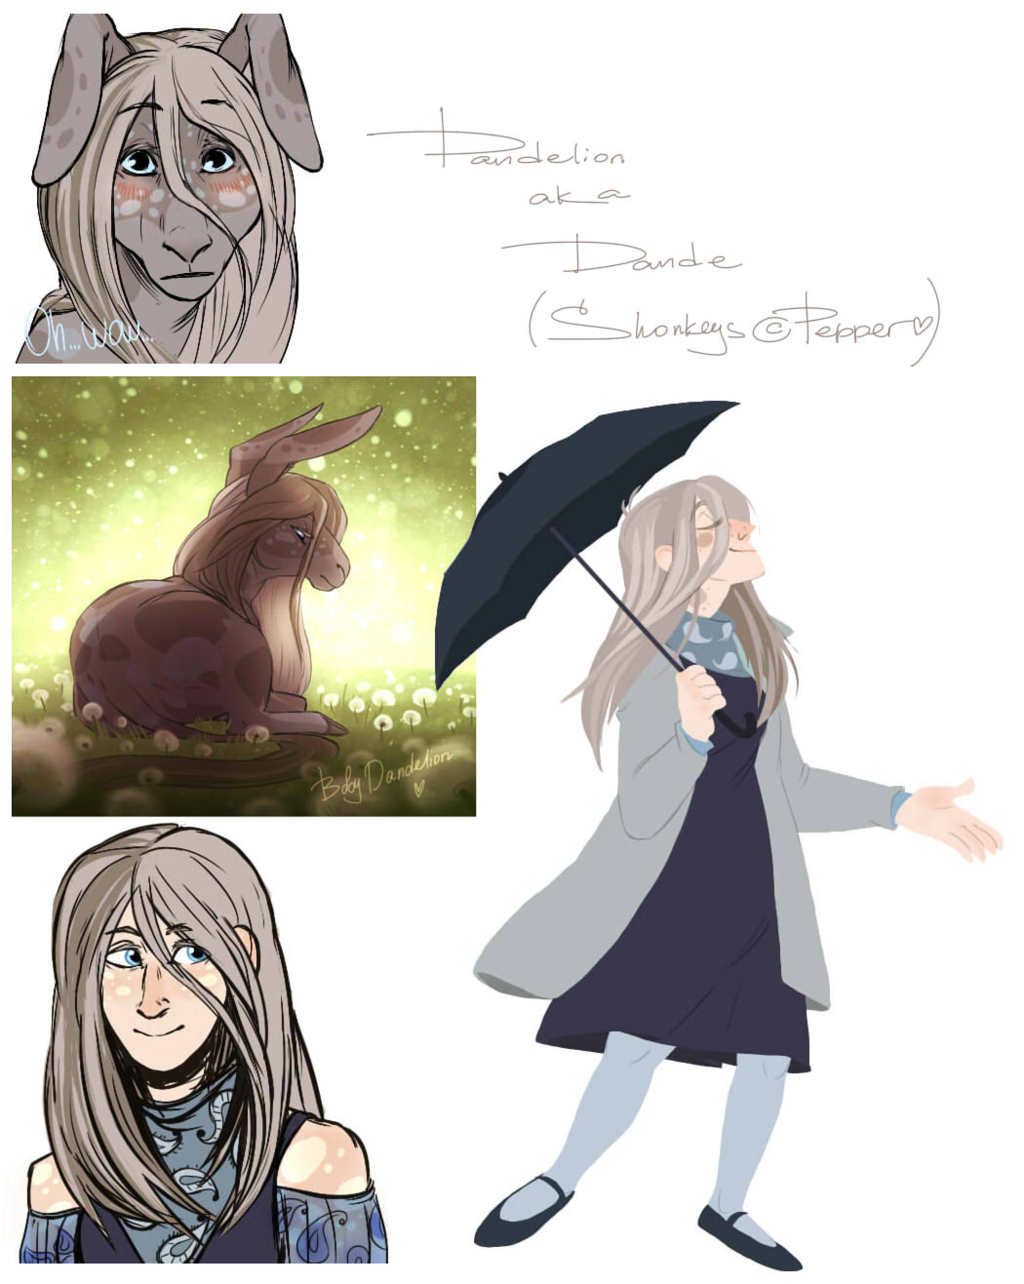 Dandelion the Shonkey